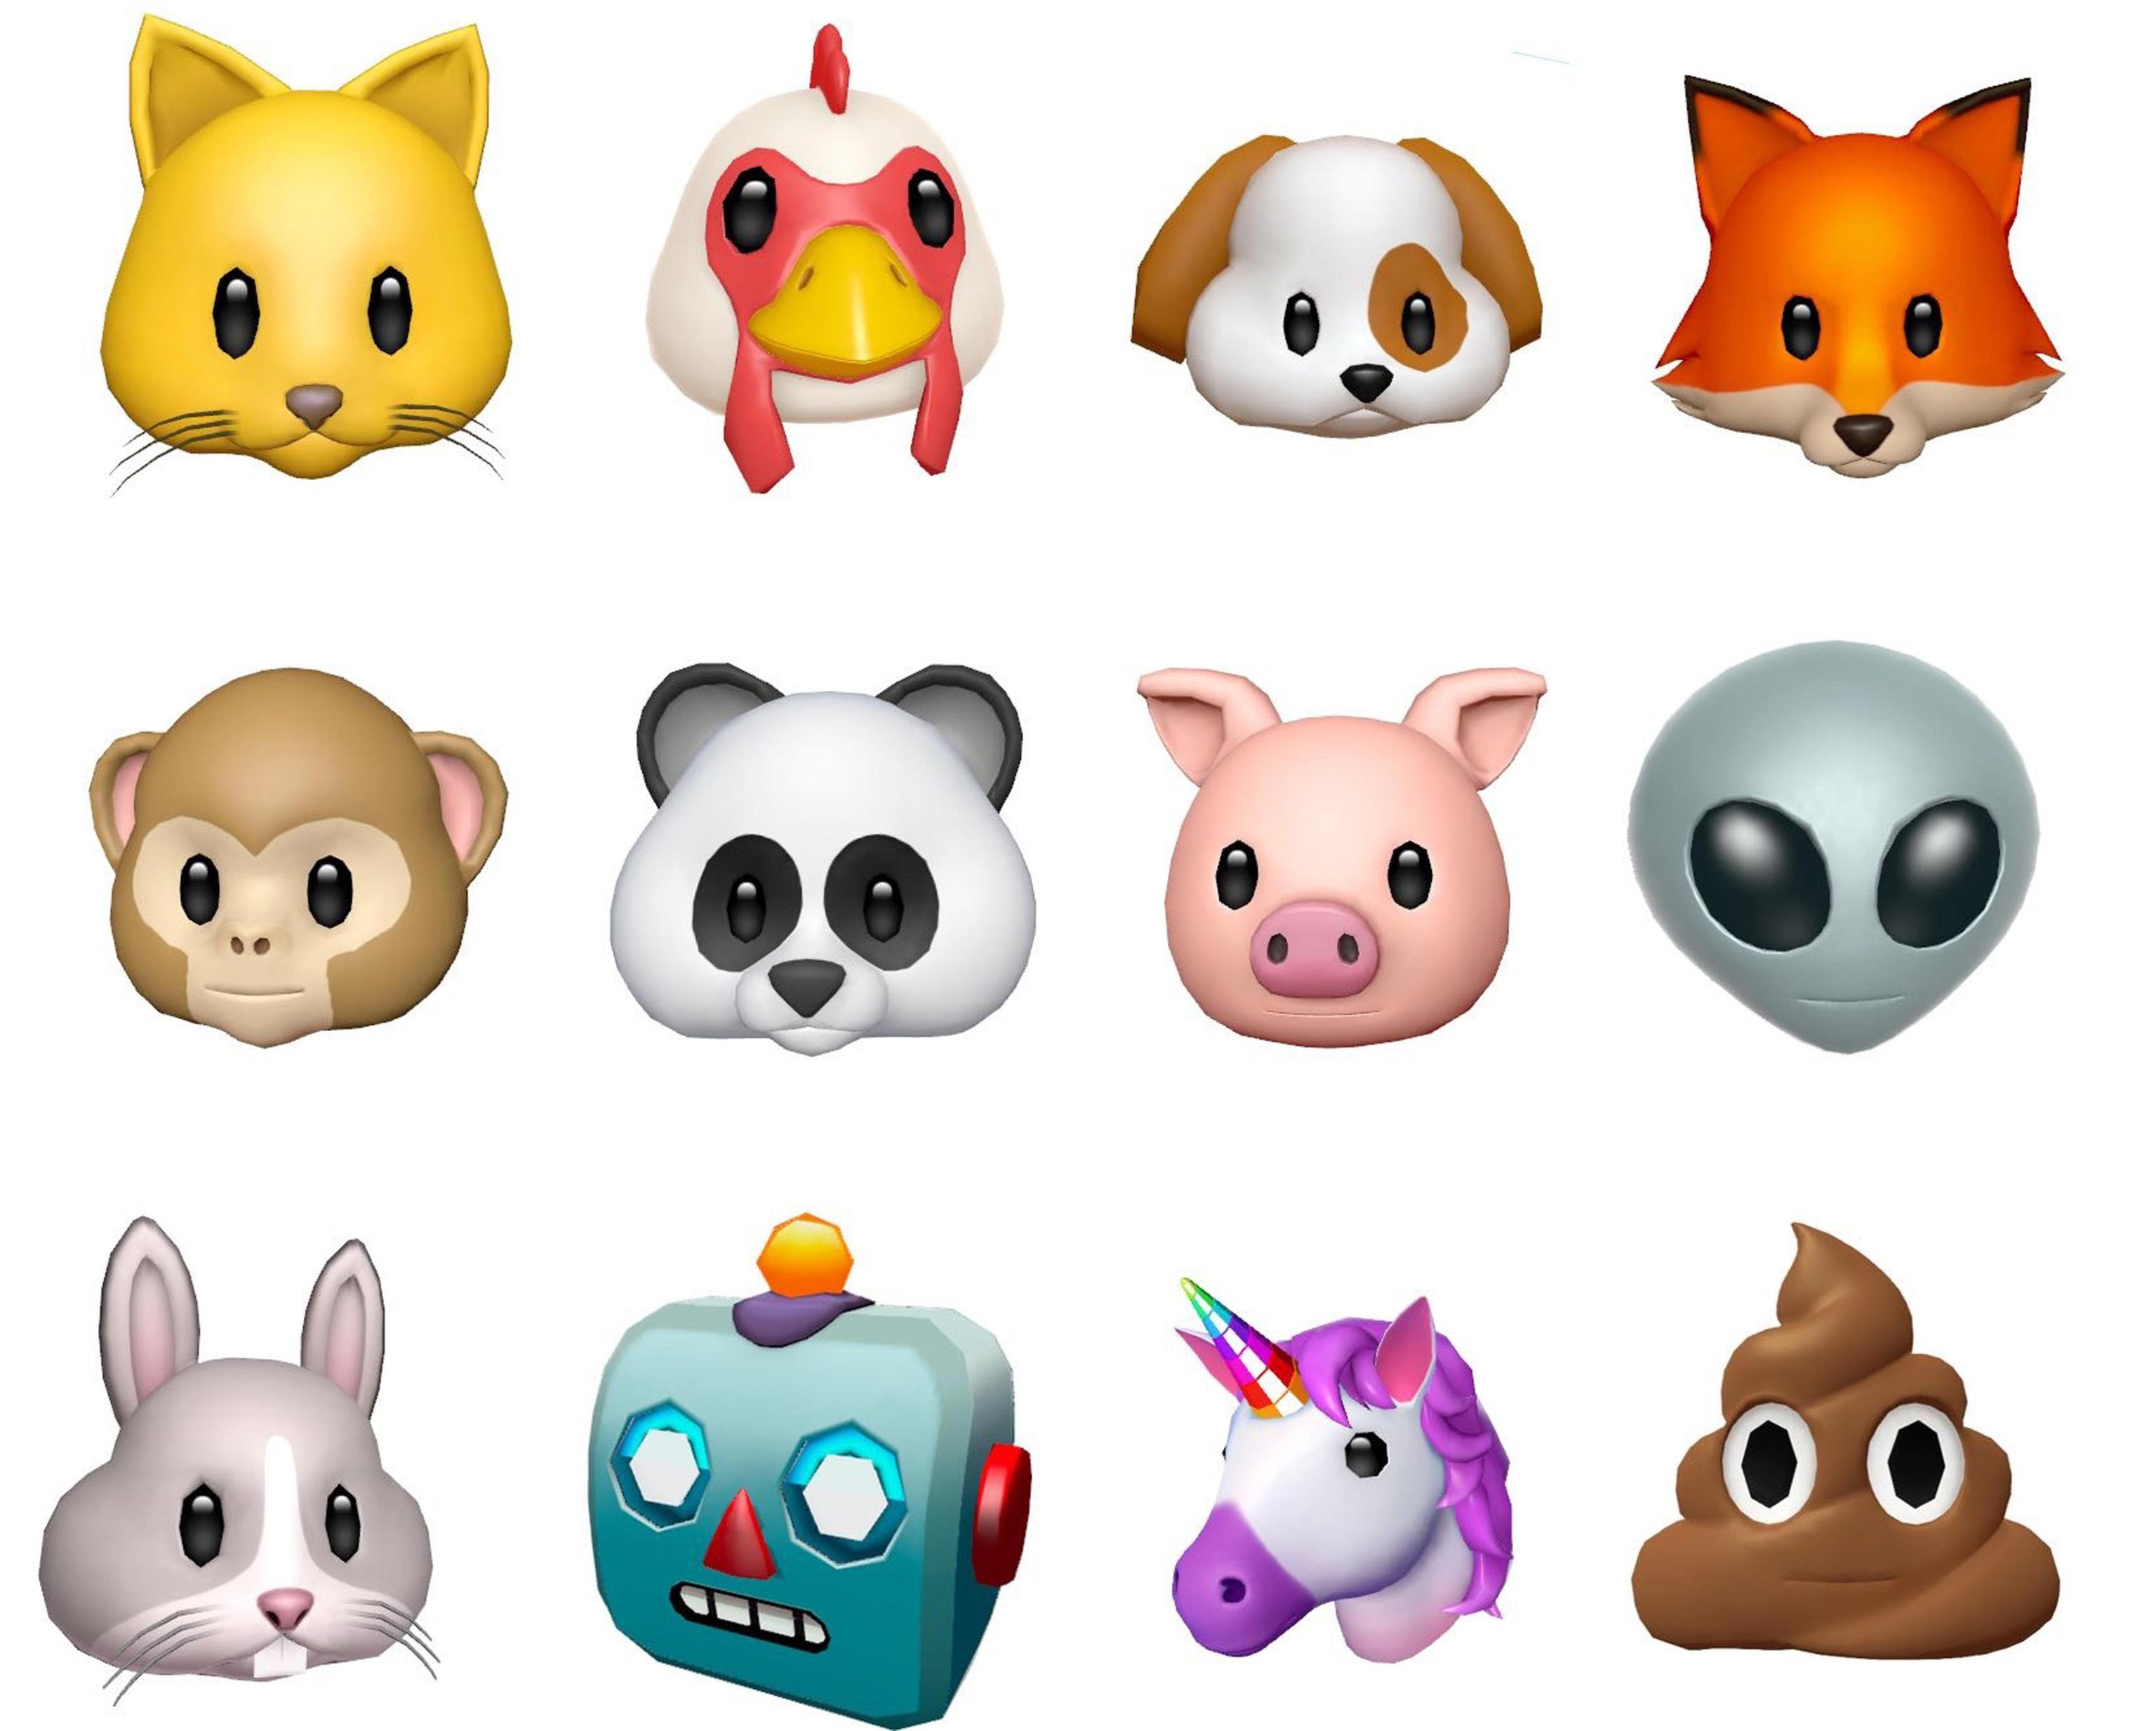 iPhone X, Animoji anche senza Face ID